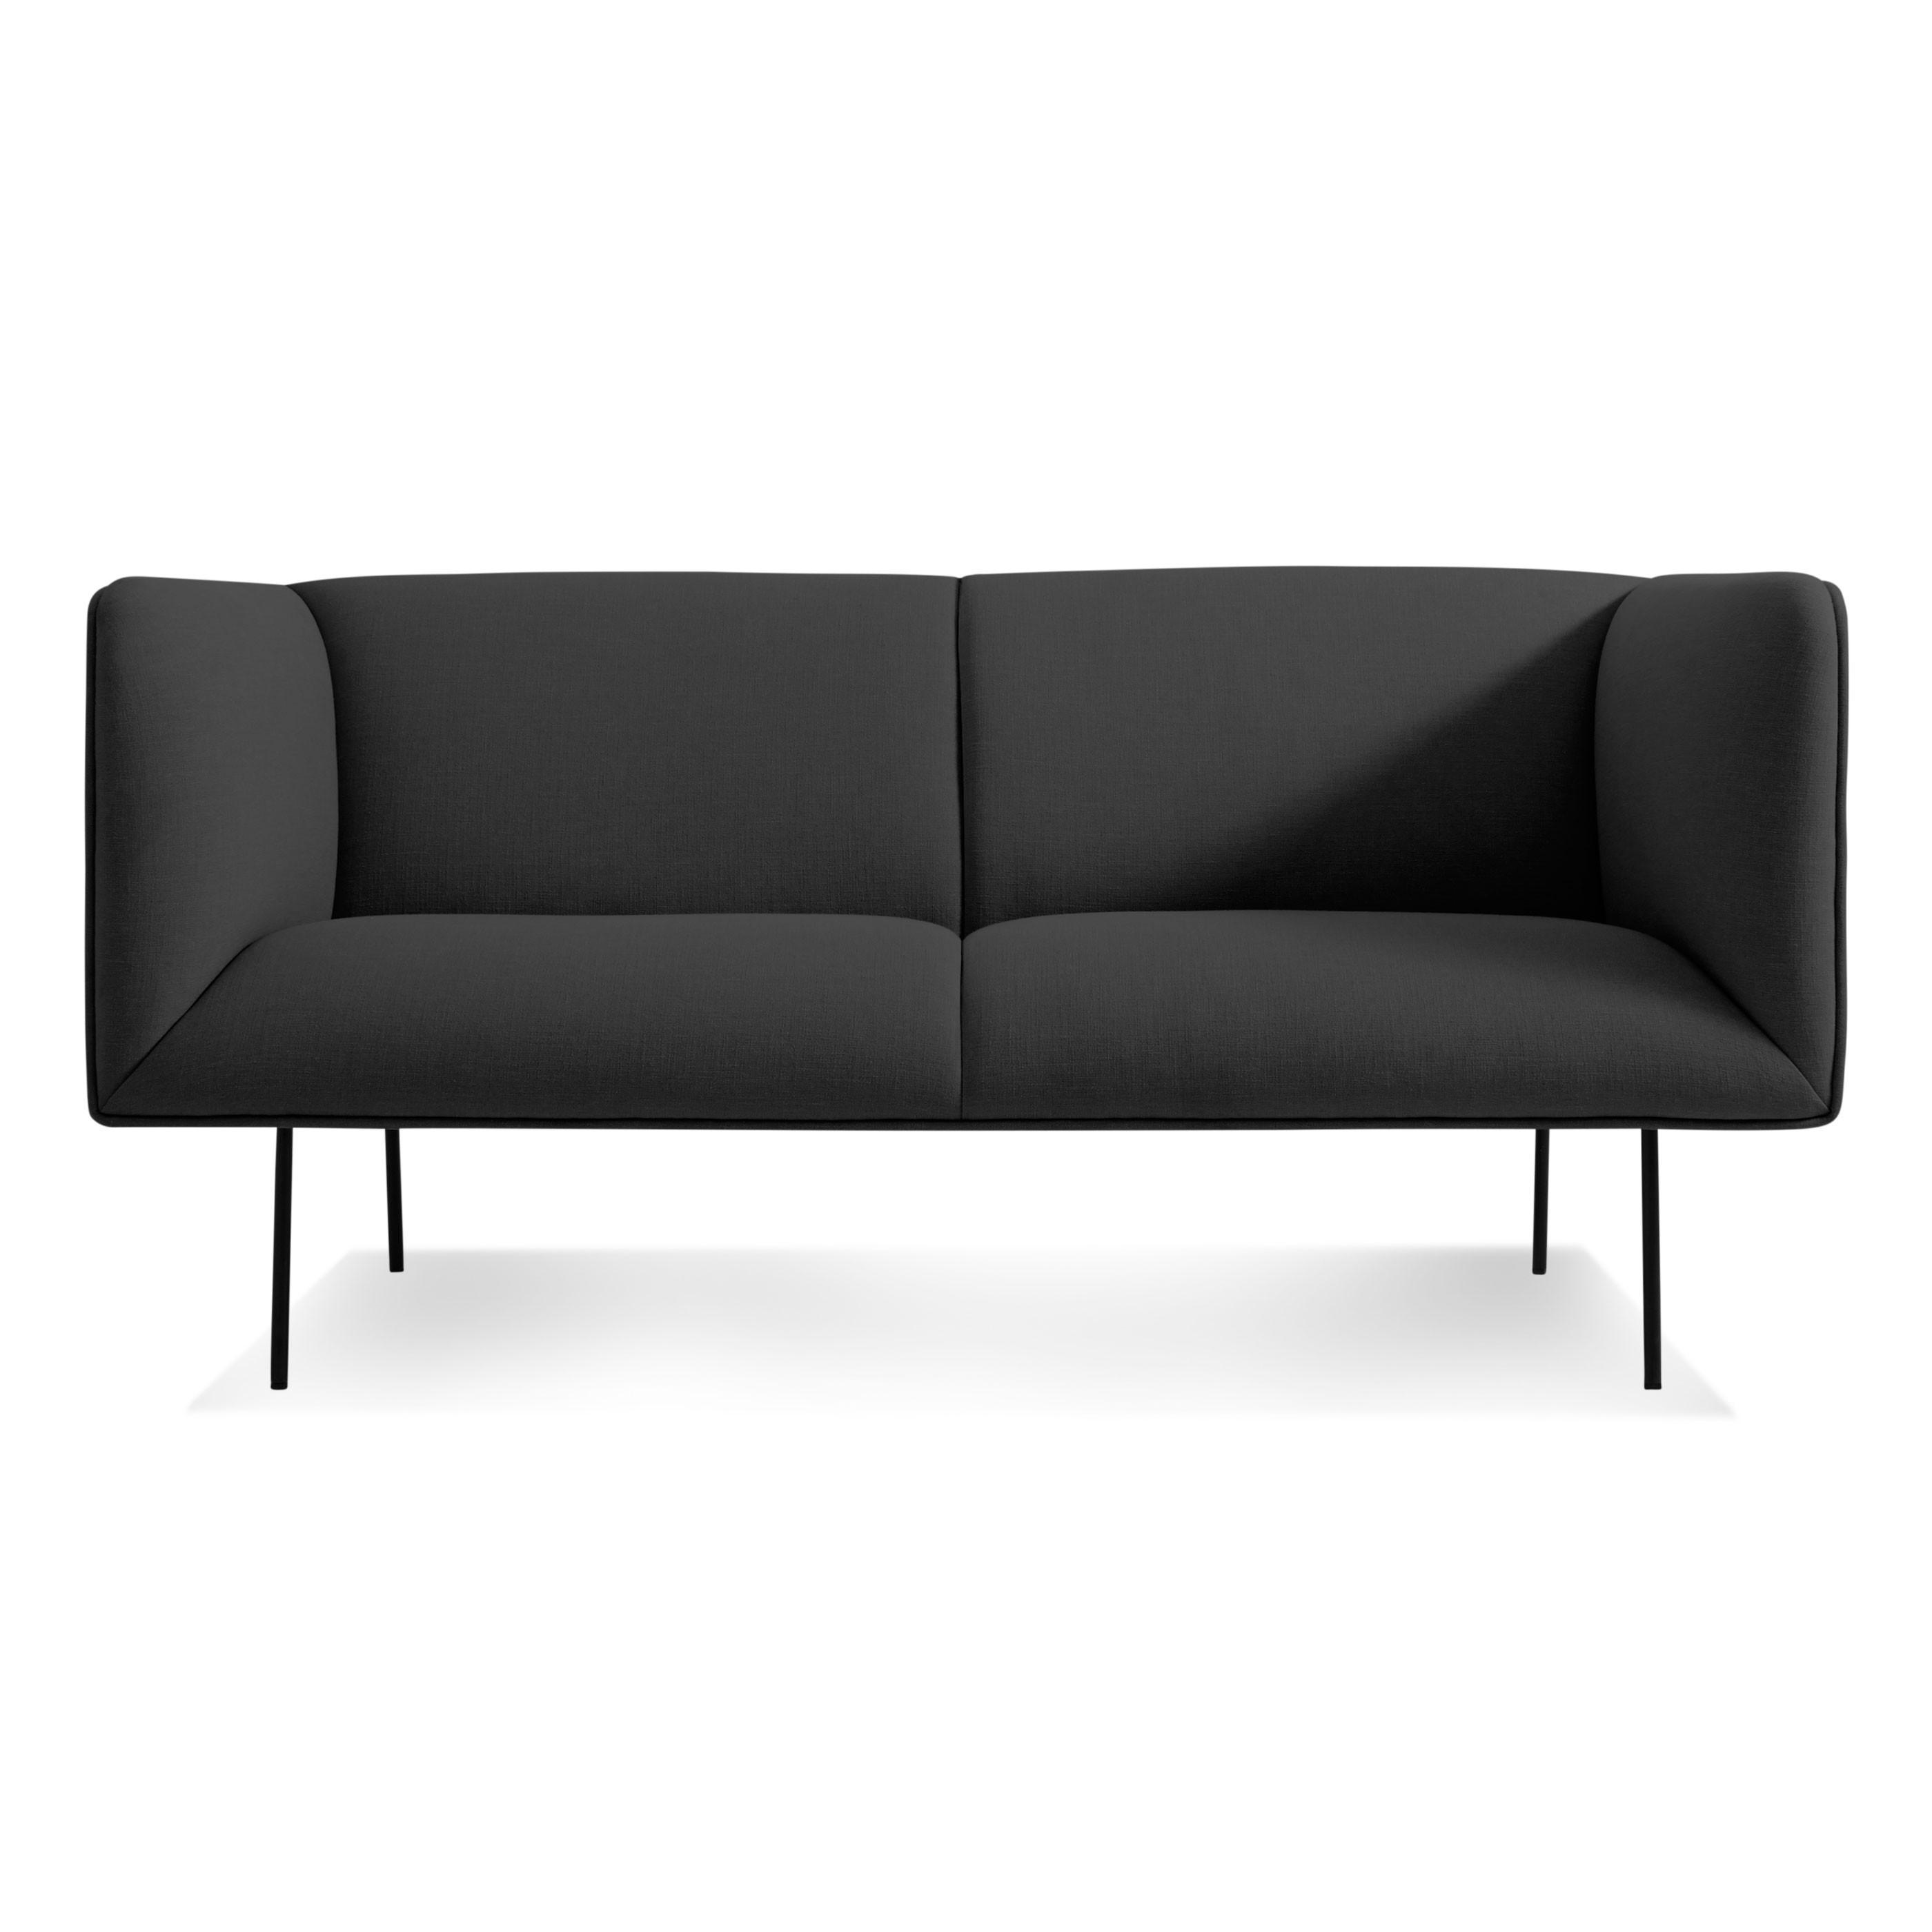 "Dandy 86"" Fabric Sofa – Modern Fabric Sofa | Blu Dot For Sofas With High Backs (Image 3 of 20)"